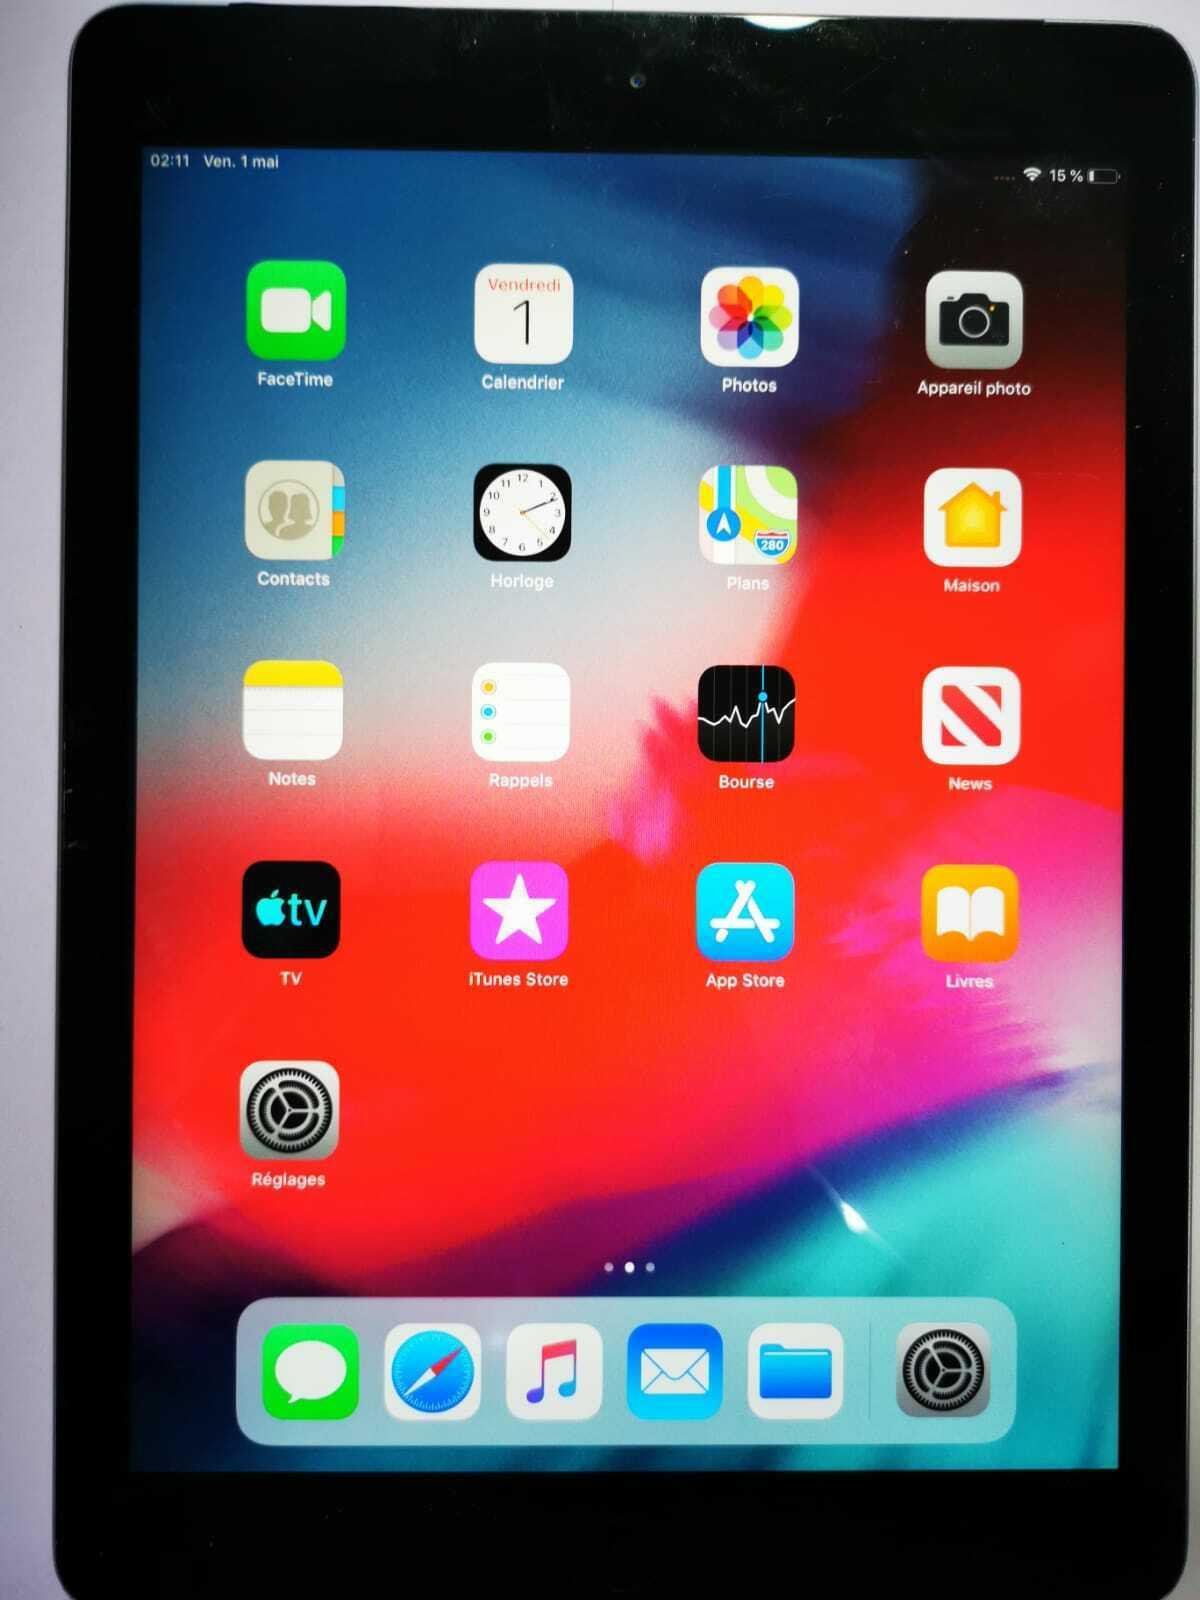 Apple ipad air 1ère génération 9,7'' 32 go wi-fi tablette - gris sidéral -nu2850